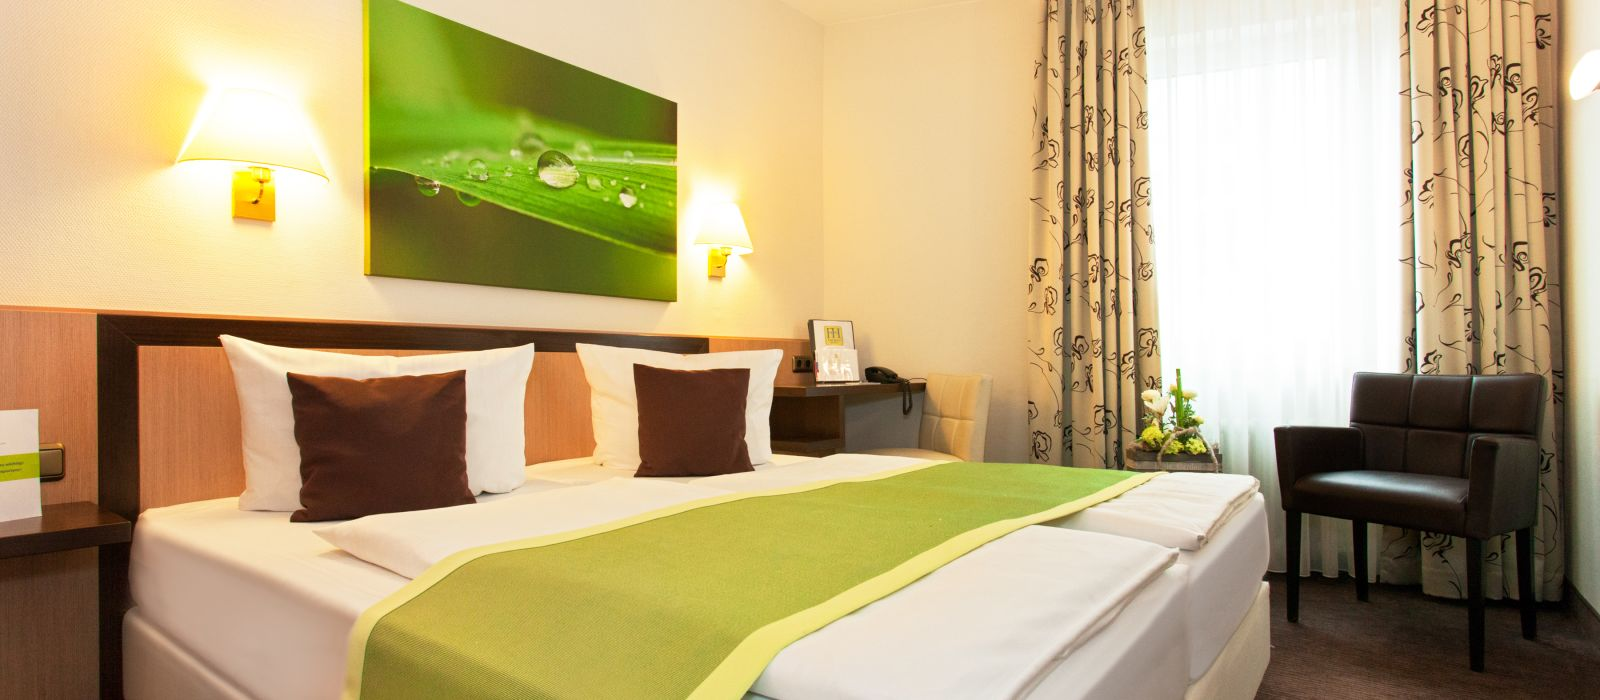 Hotel Favored  Domicil Frankfurt Germany